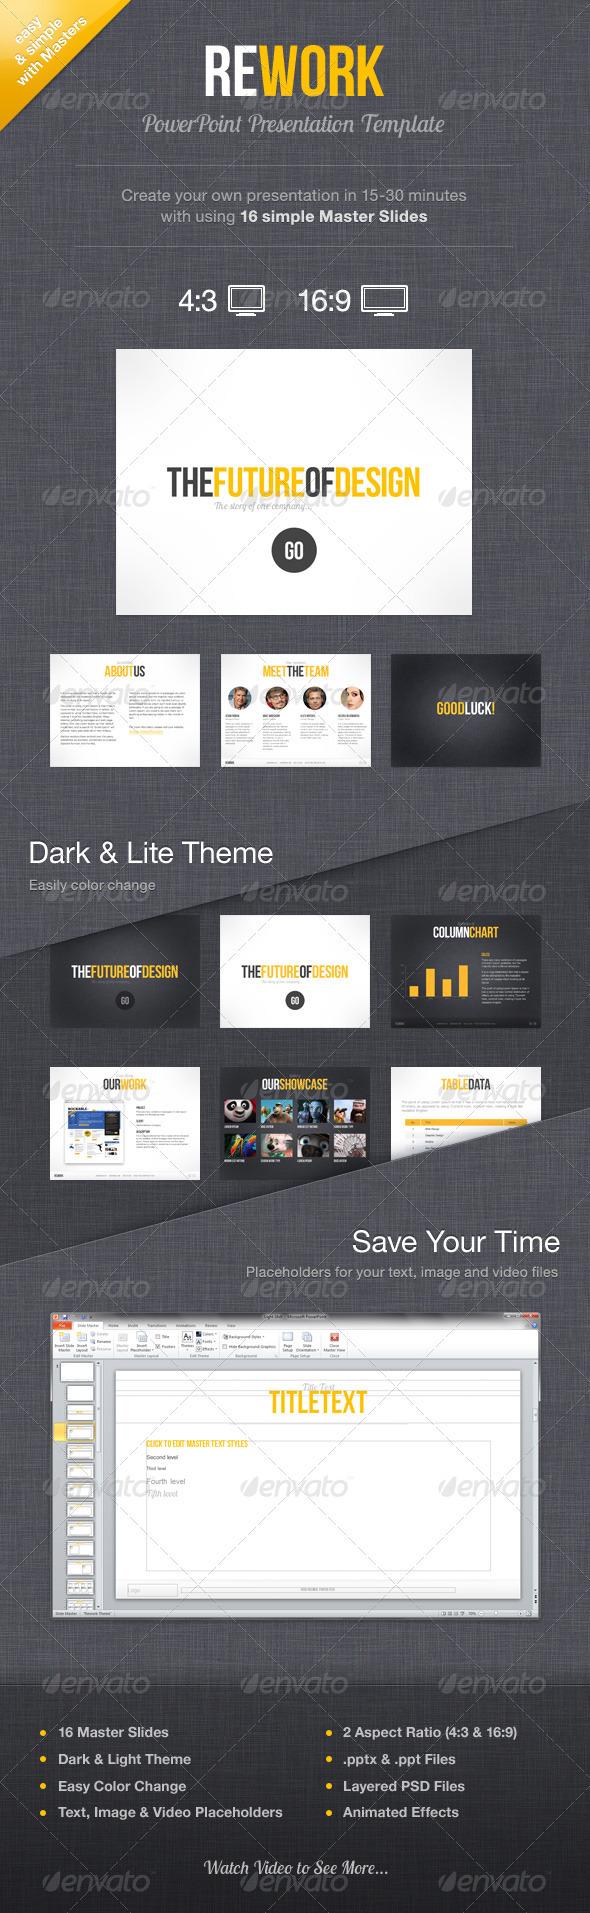 GraphicRiver Rework PowerPoint Presentation Template 1249481